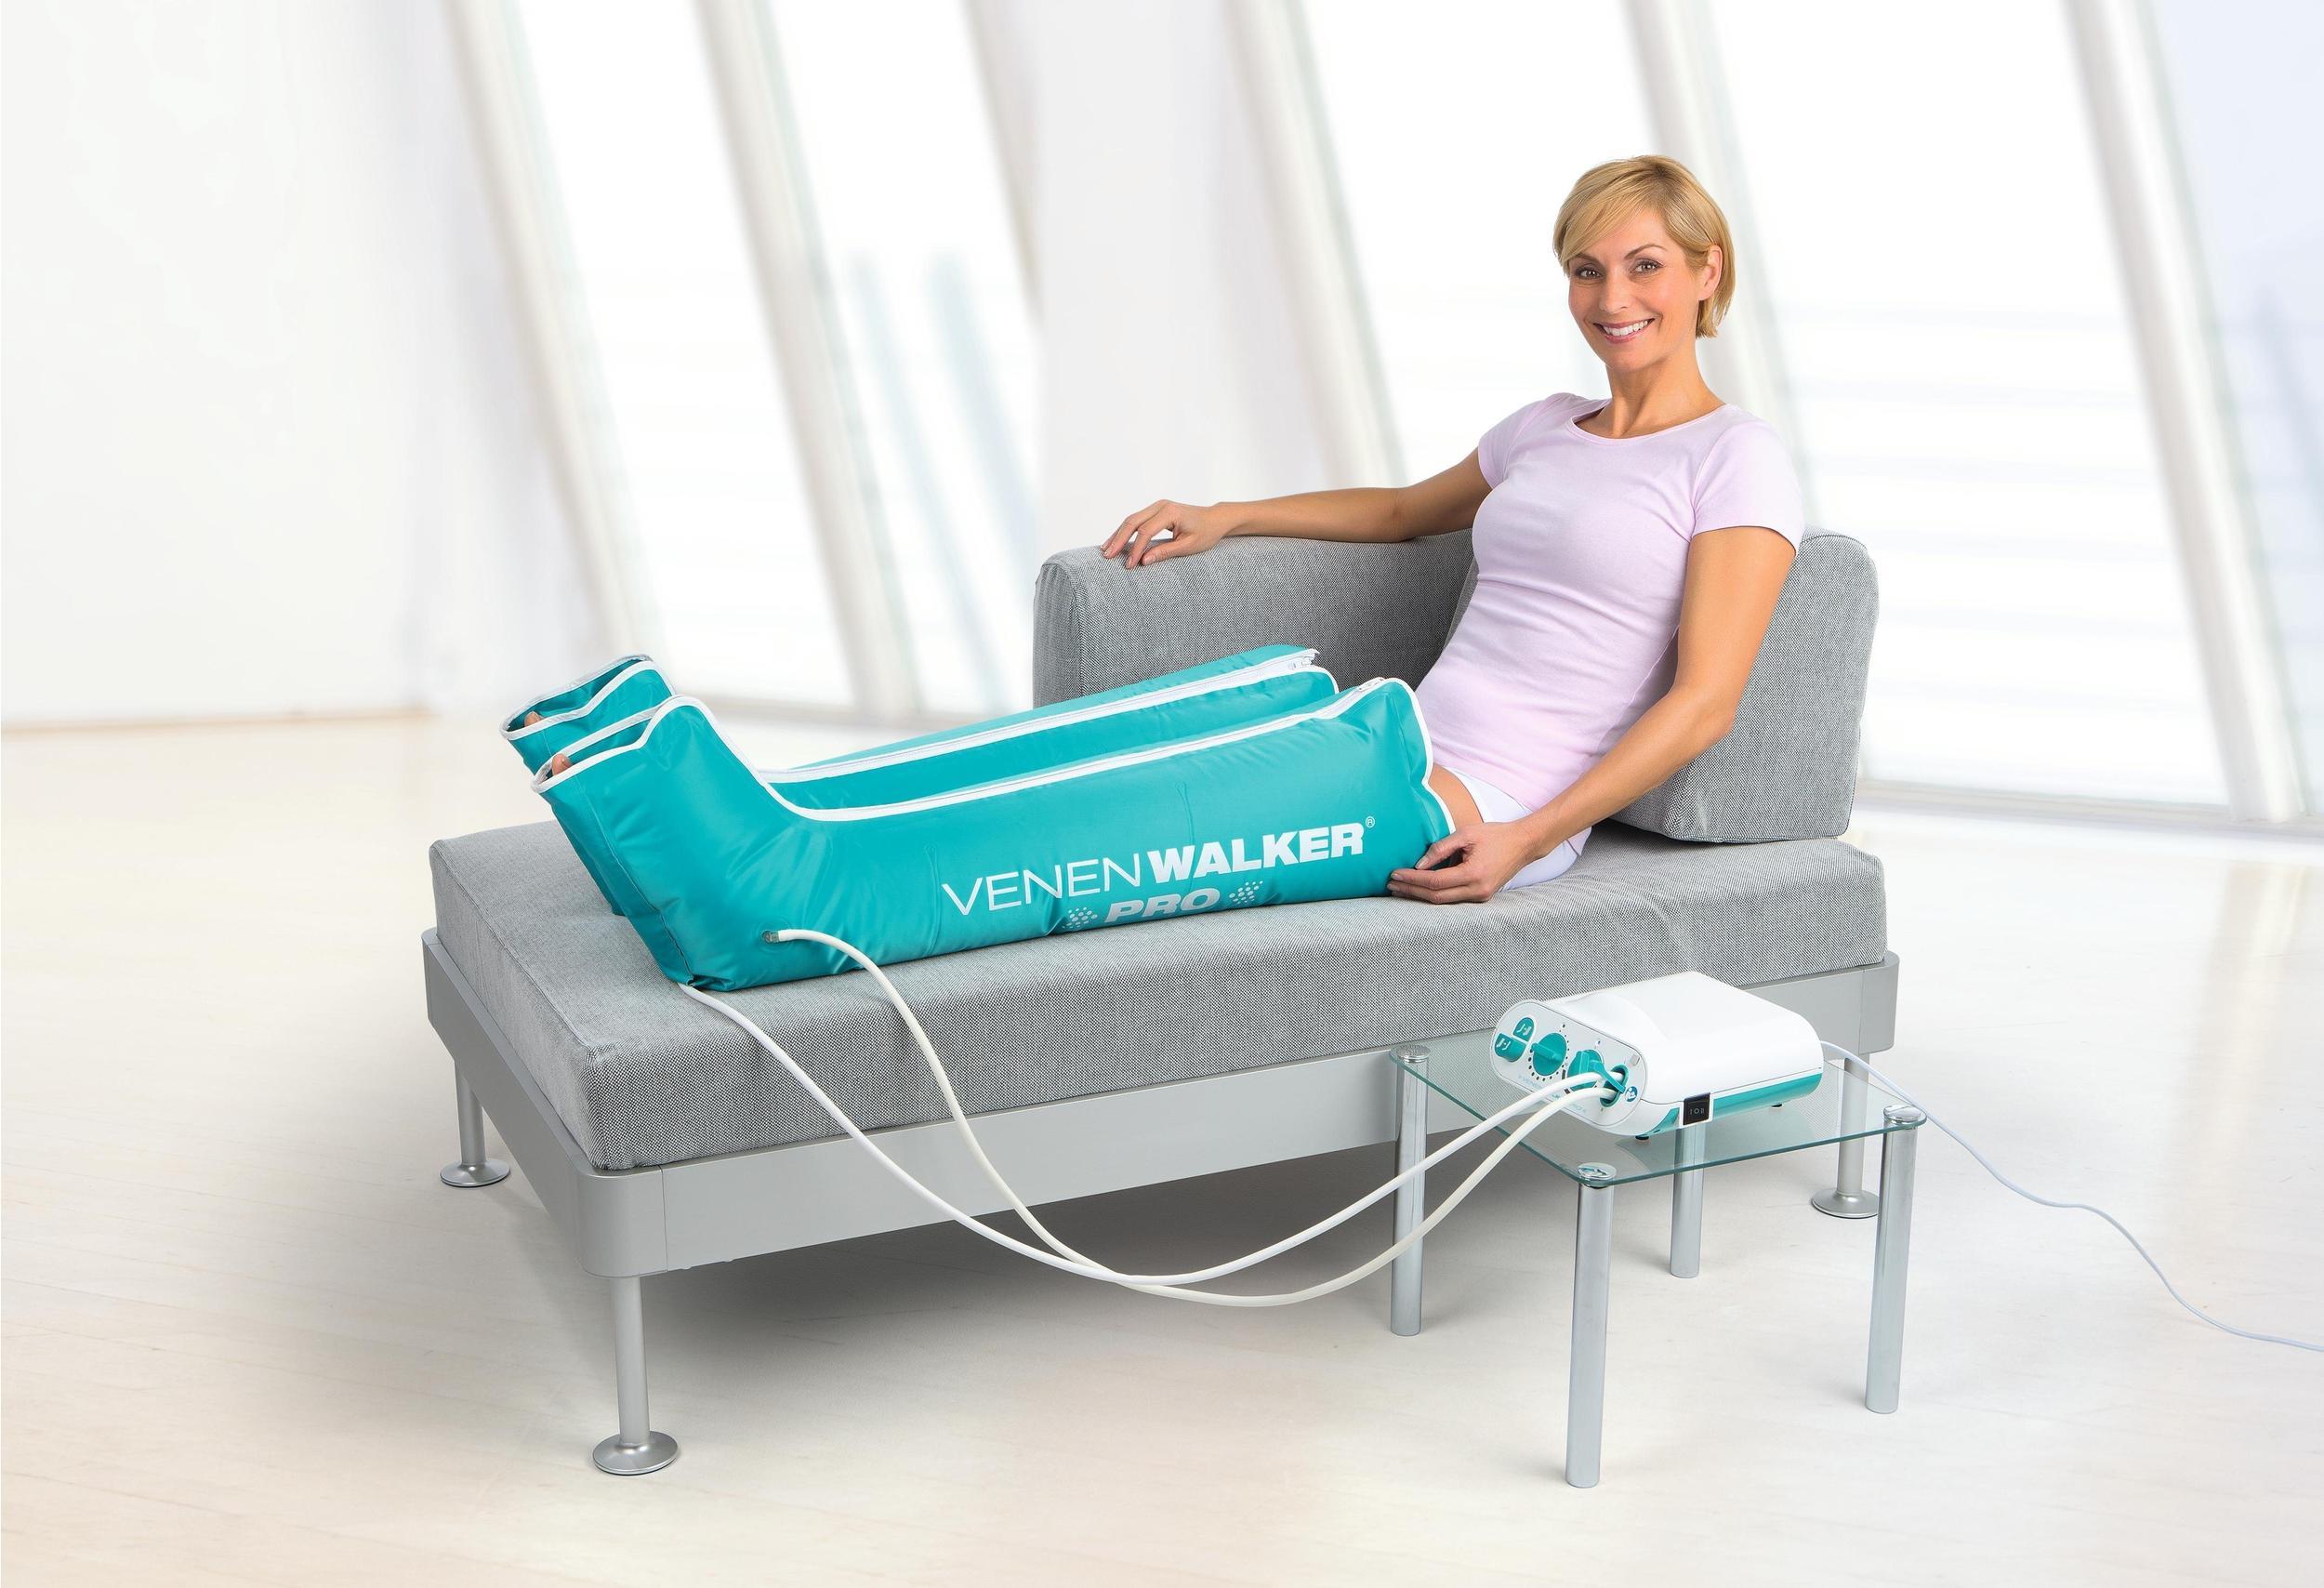 VITALmaxx Therapiegerät VenenWalker Pro2 Test   Angebote ...